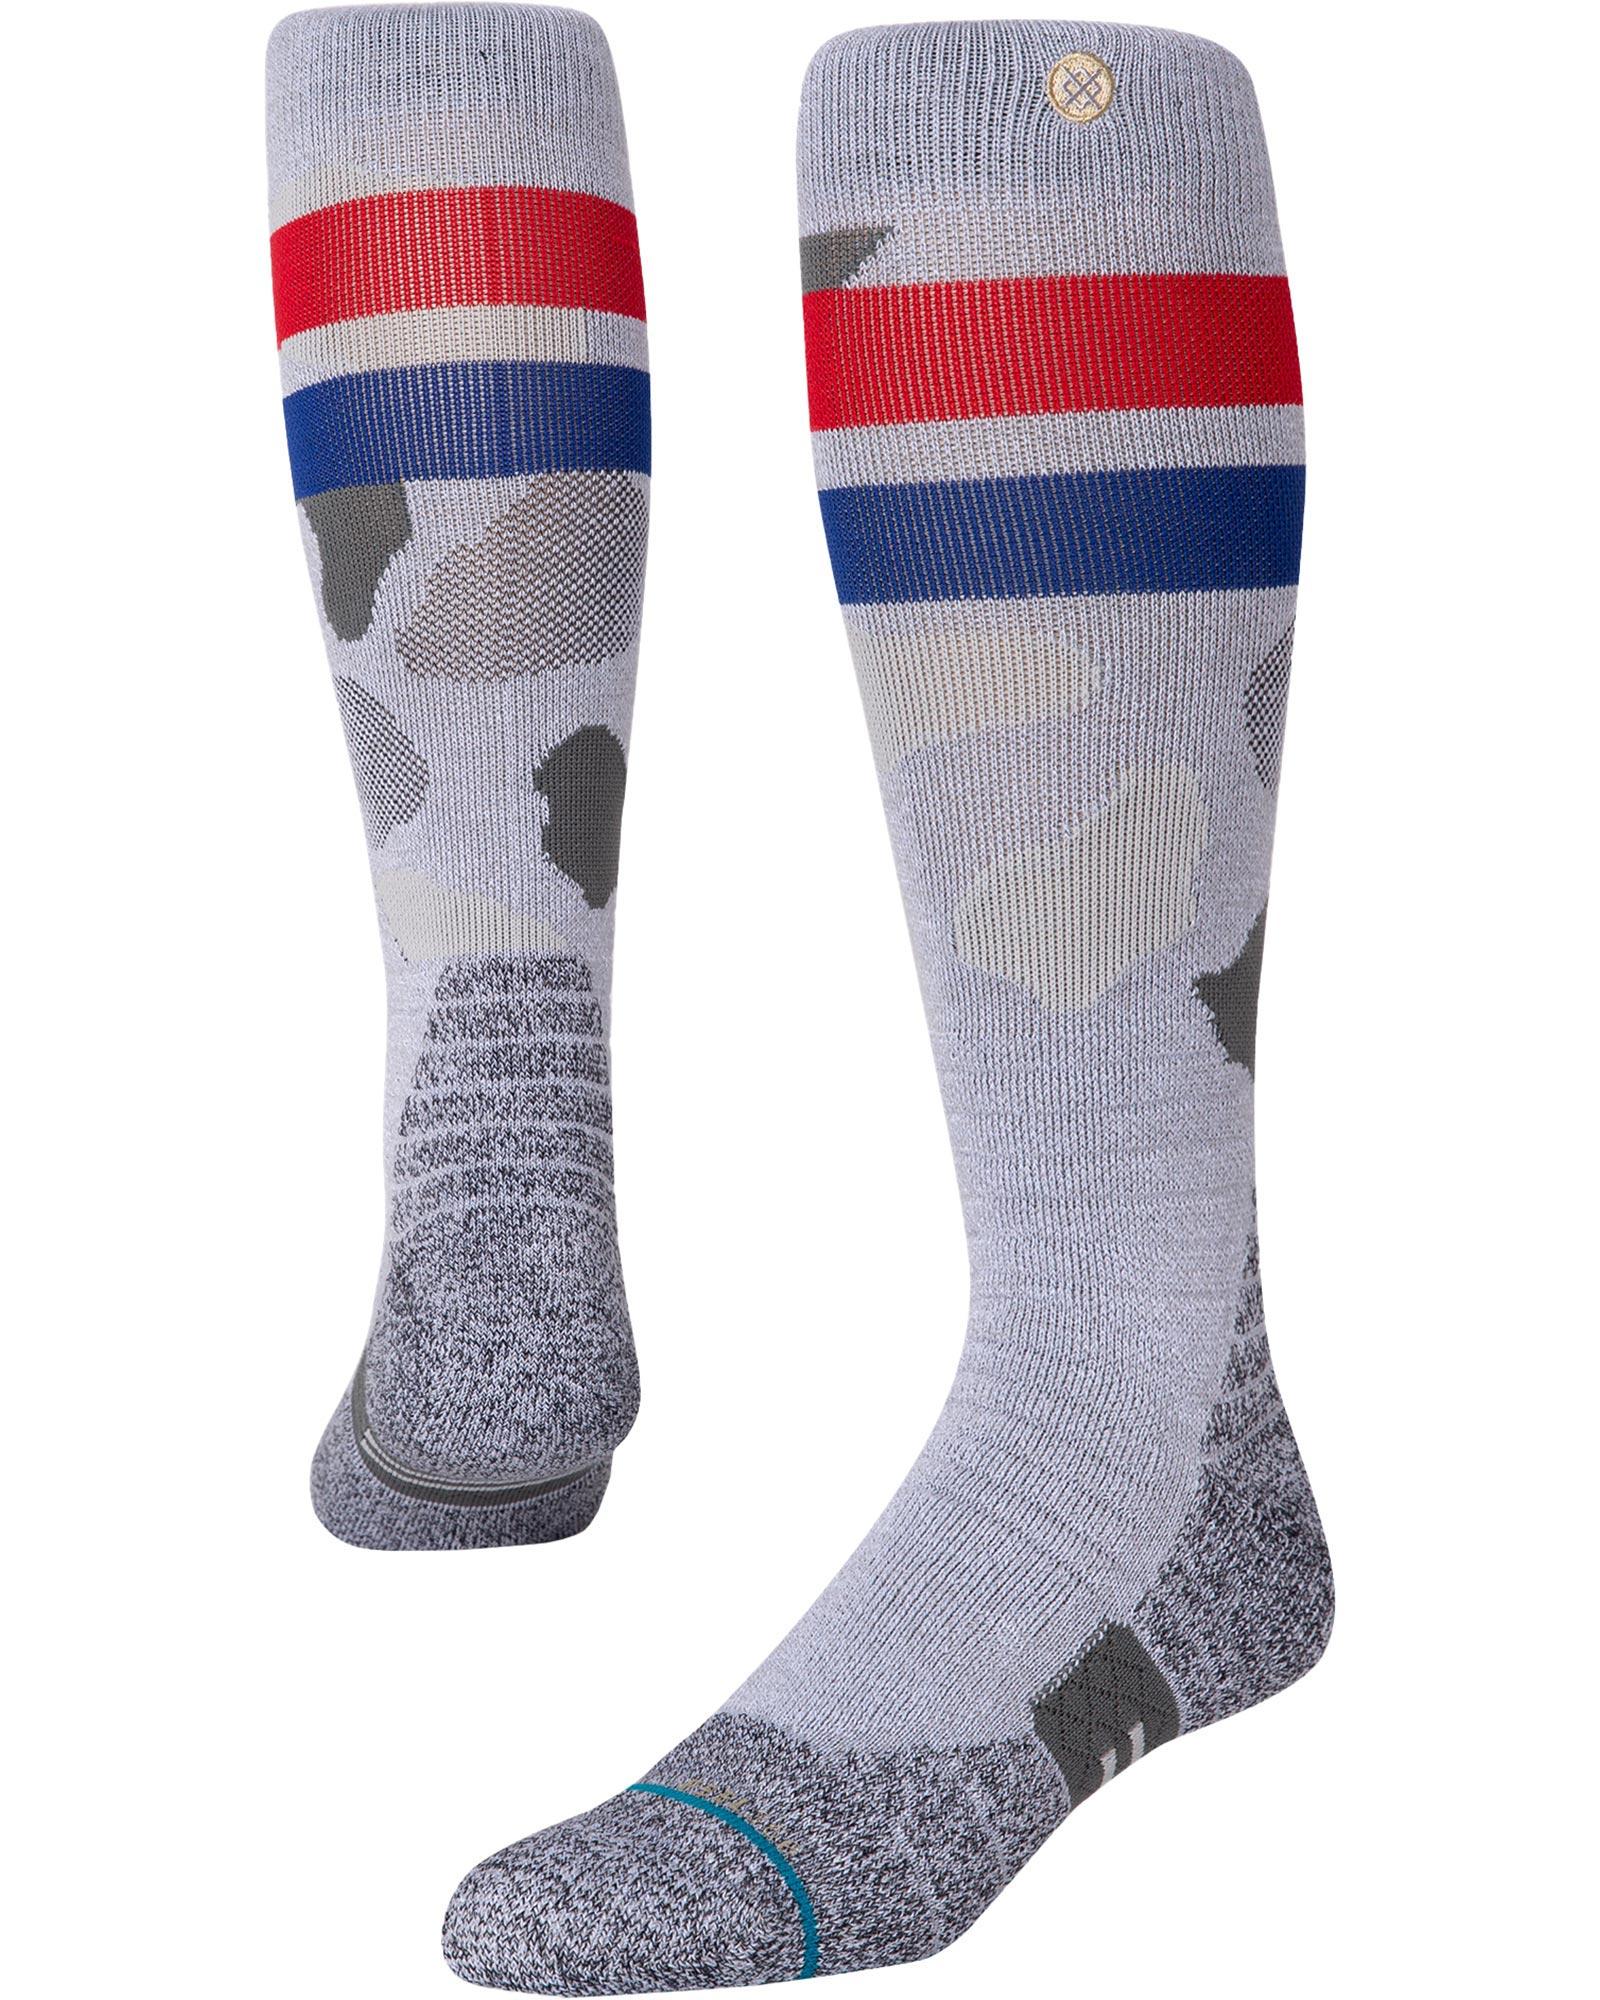 Stance Mens Ralph Snowboard Socks